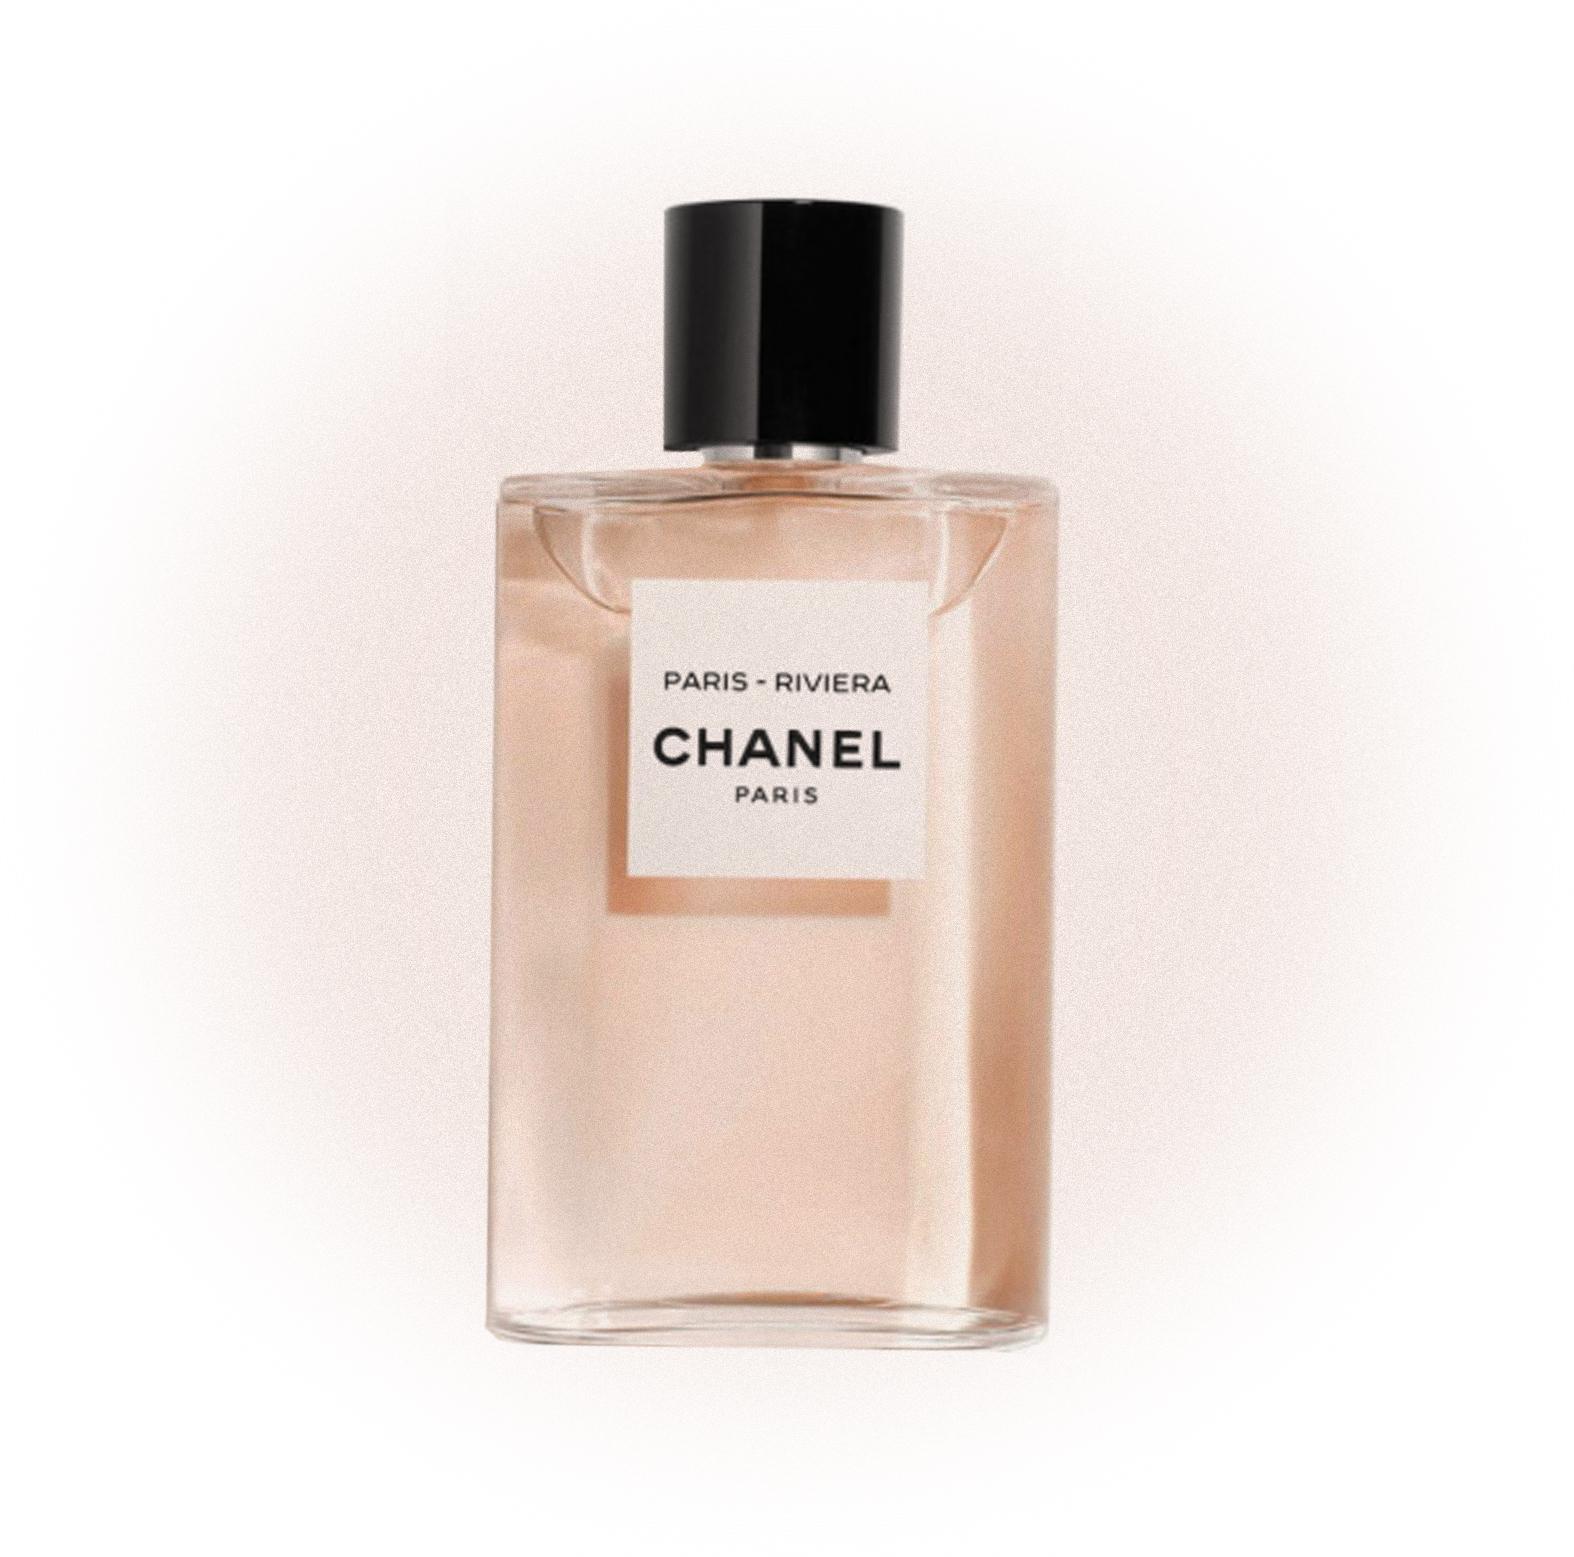 Paris – Riviera, Chanel